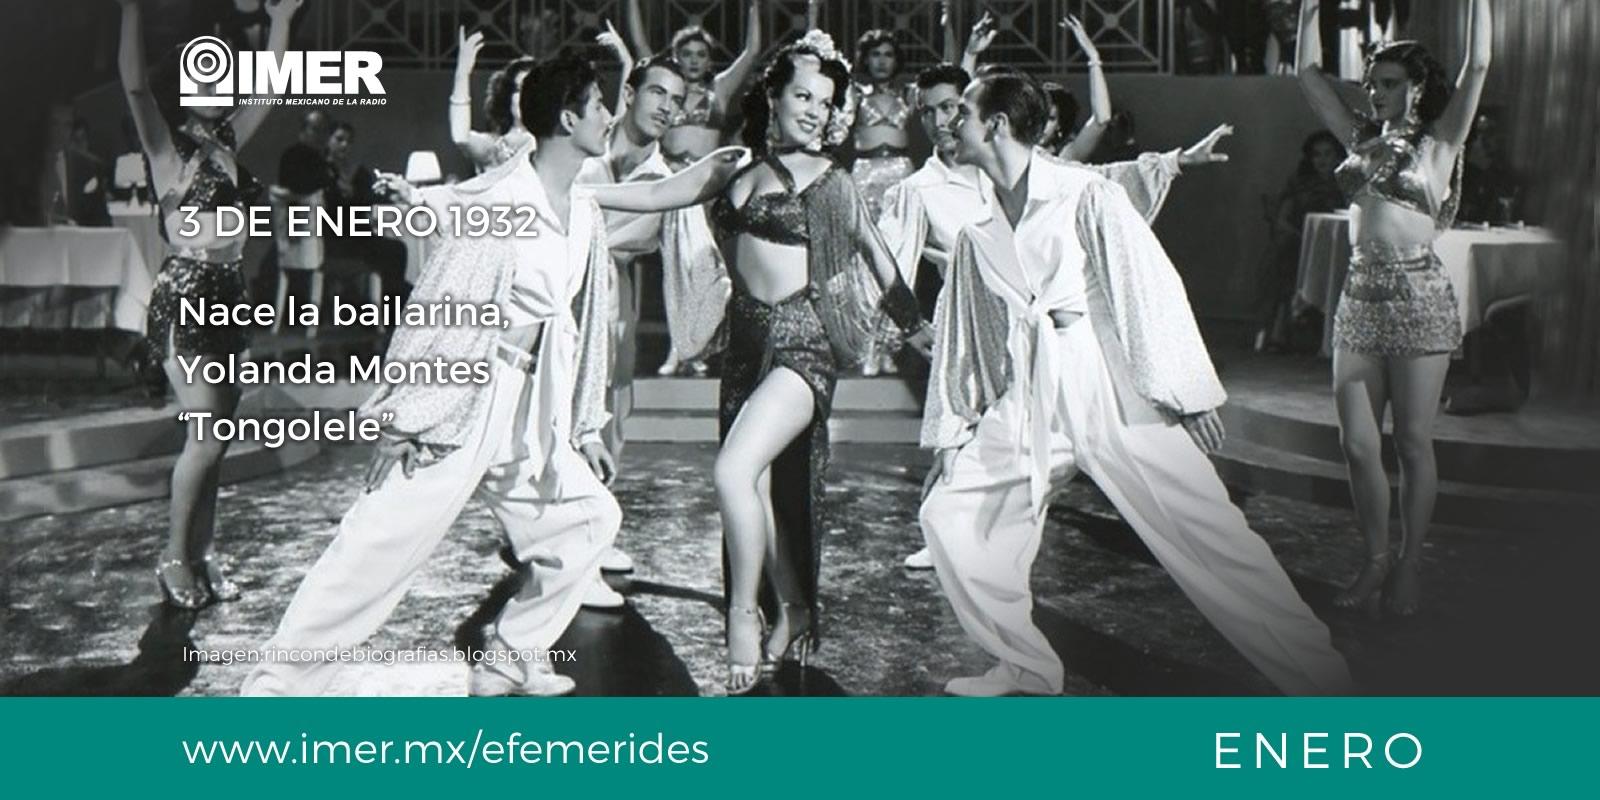 3 de enero de 1932 nace Yolanda Montes Tongolele  IMER